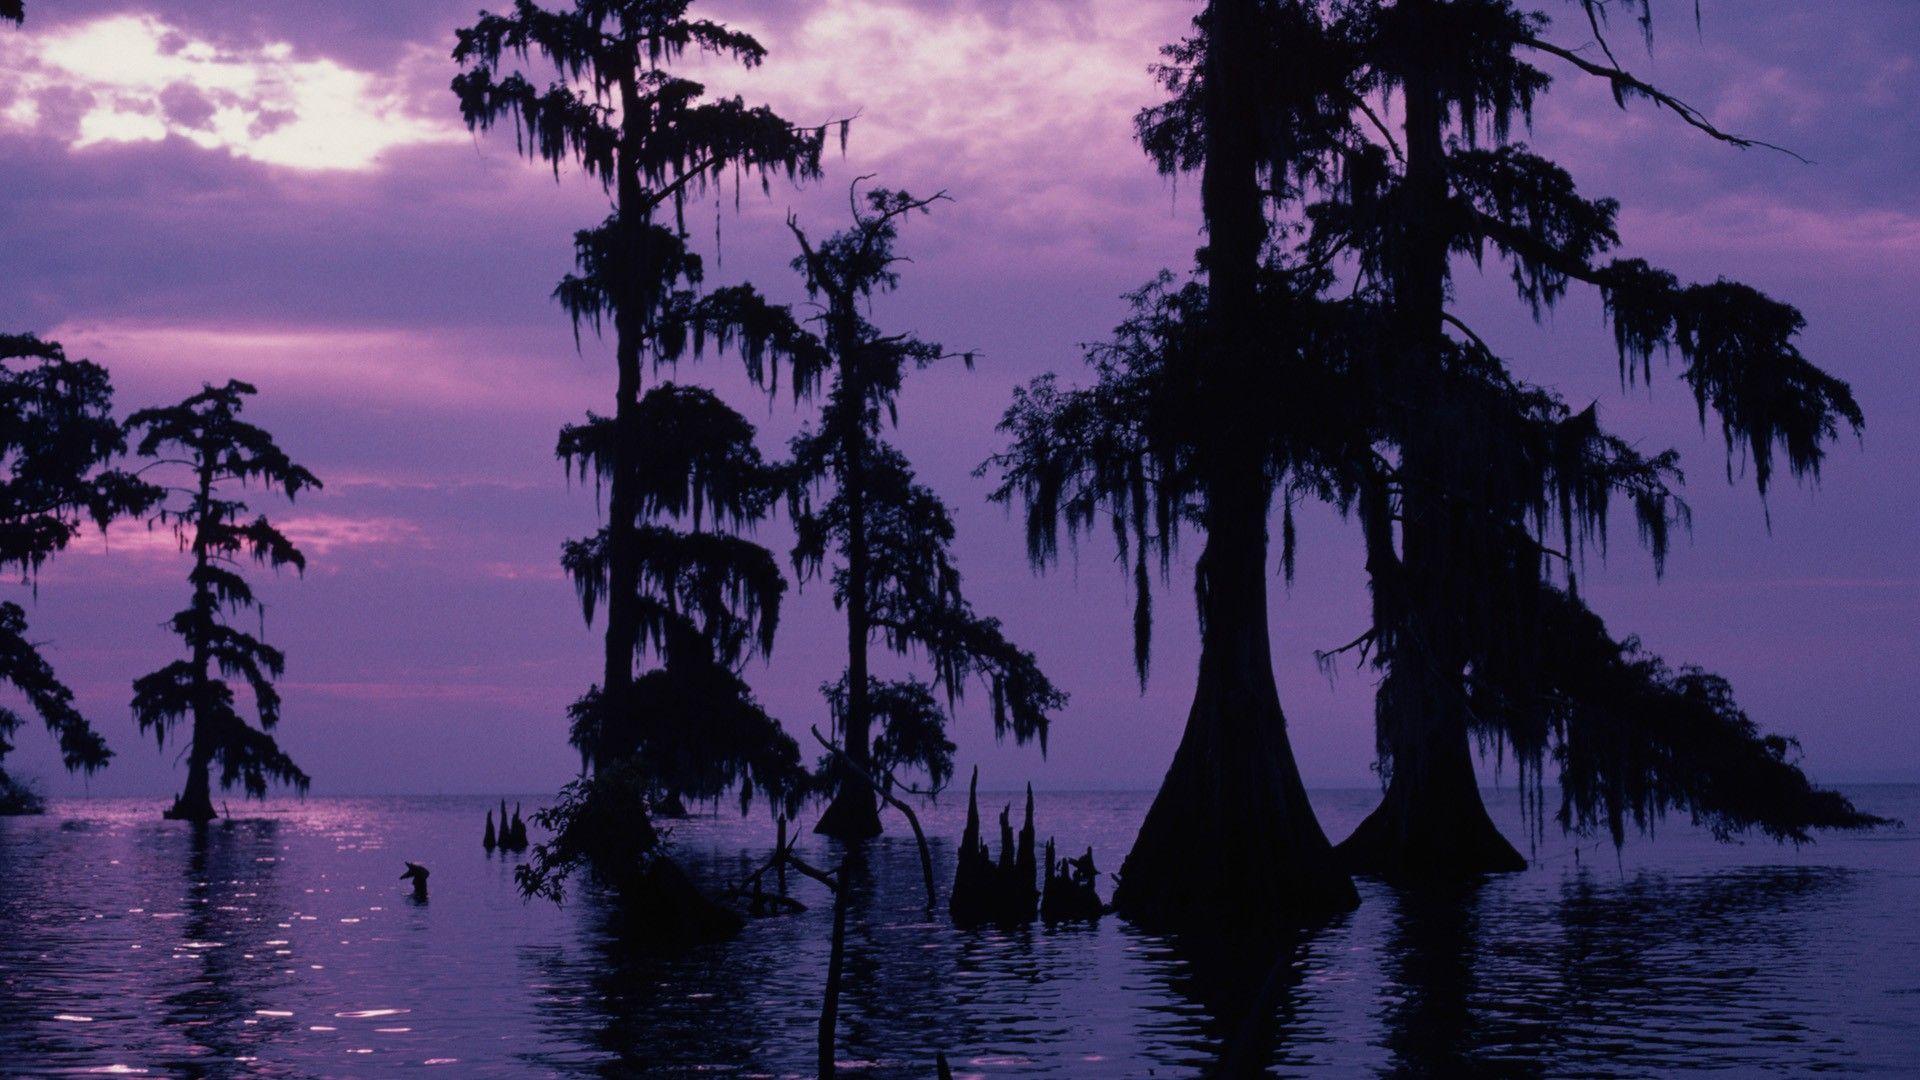 Bayou Sunset Louisiana Landscapes Louisiana bayou Purple sky 1920x1080